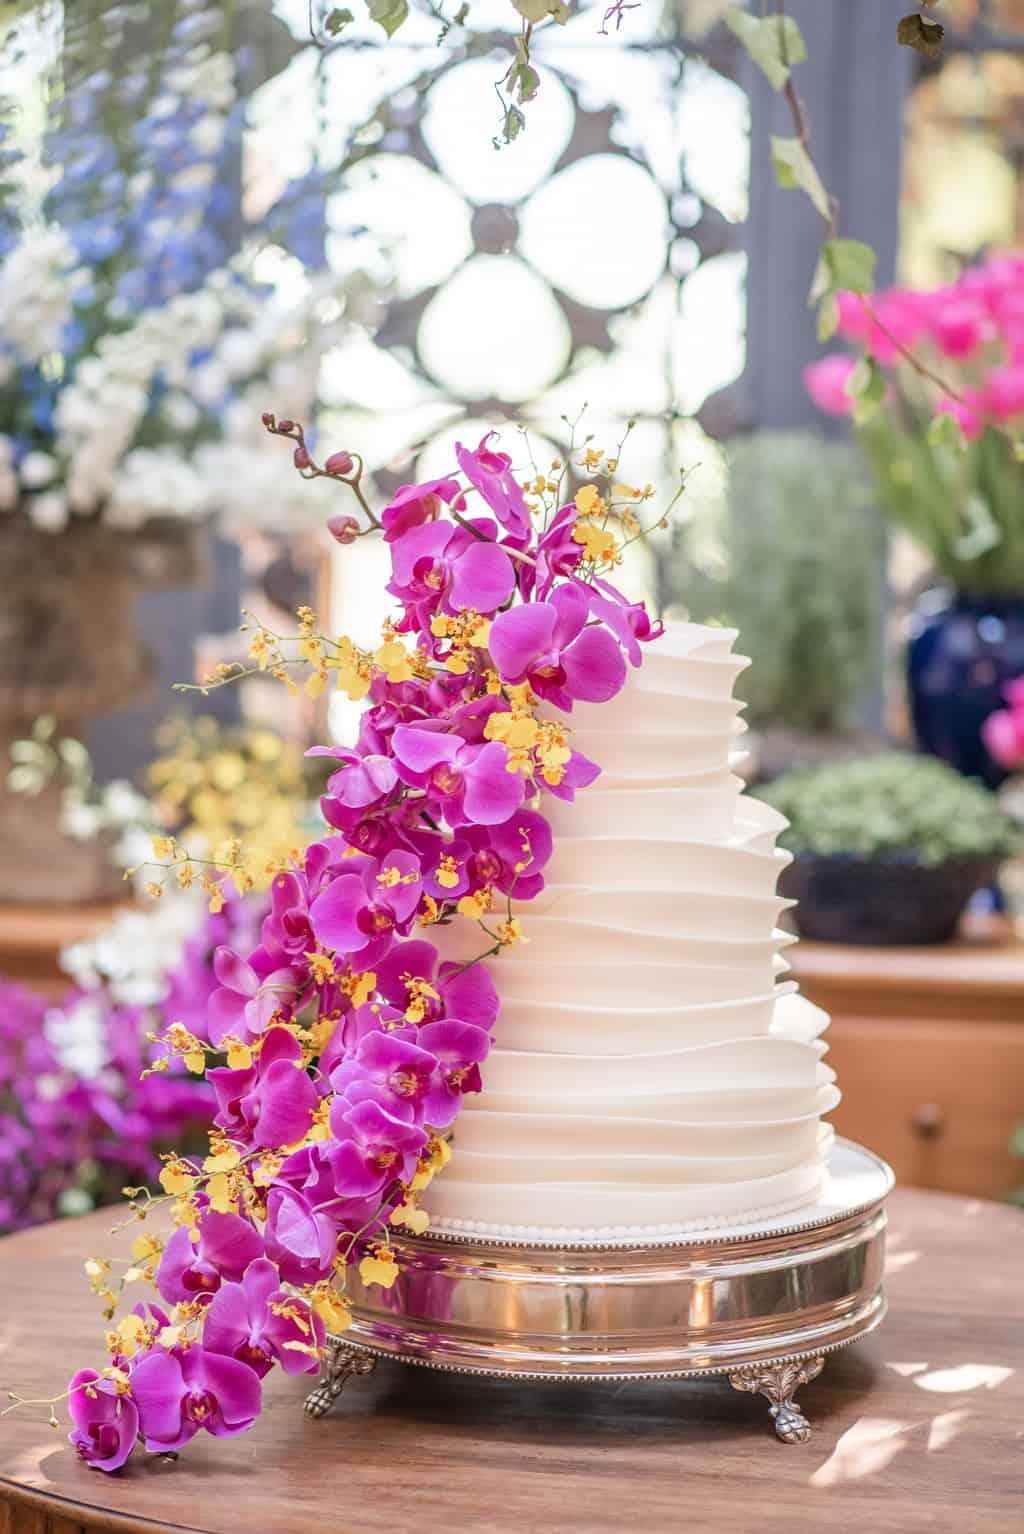 Casamento-Paula-e-Alex-Fotografia-Marina-Fava-Decor-Andrea-Kapps-Bolo-Casal-Garcia